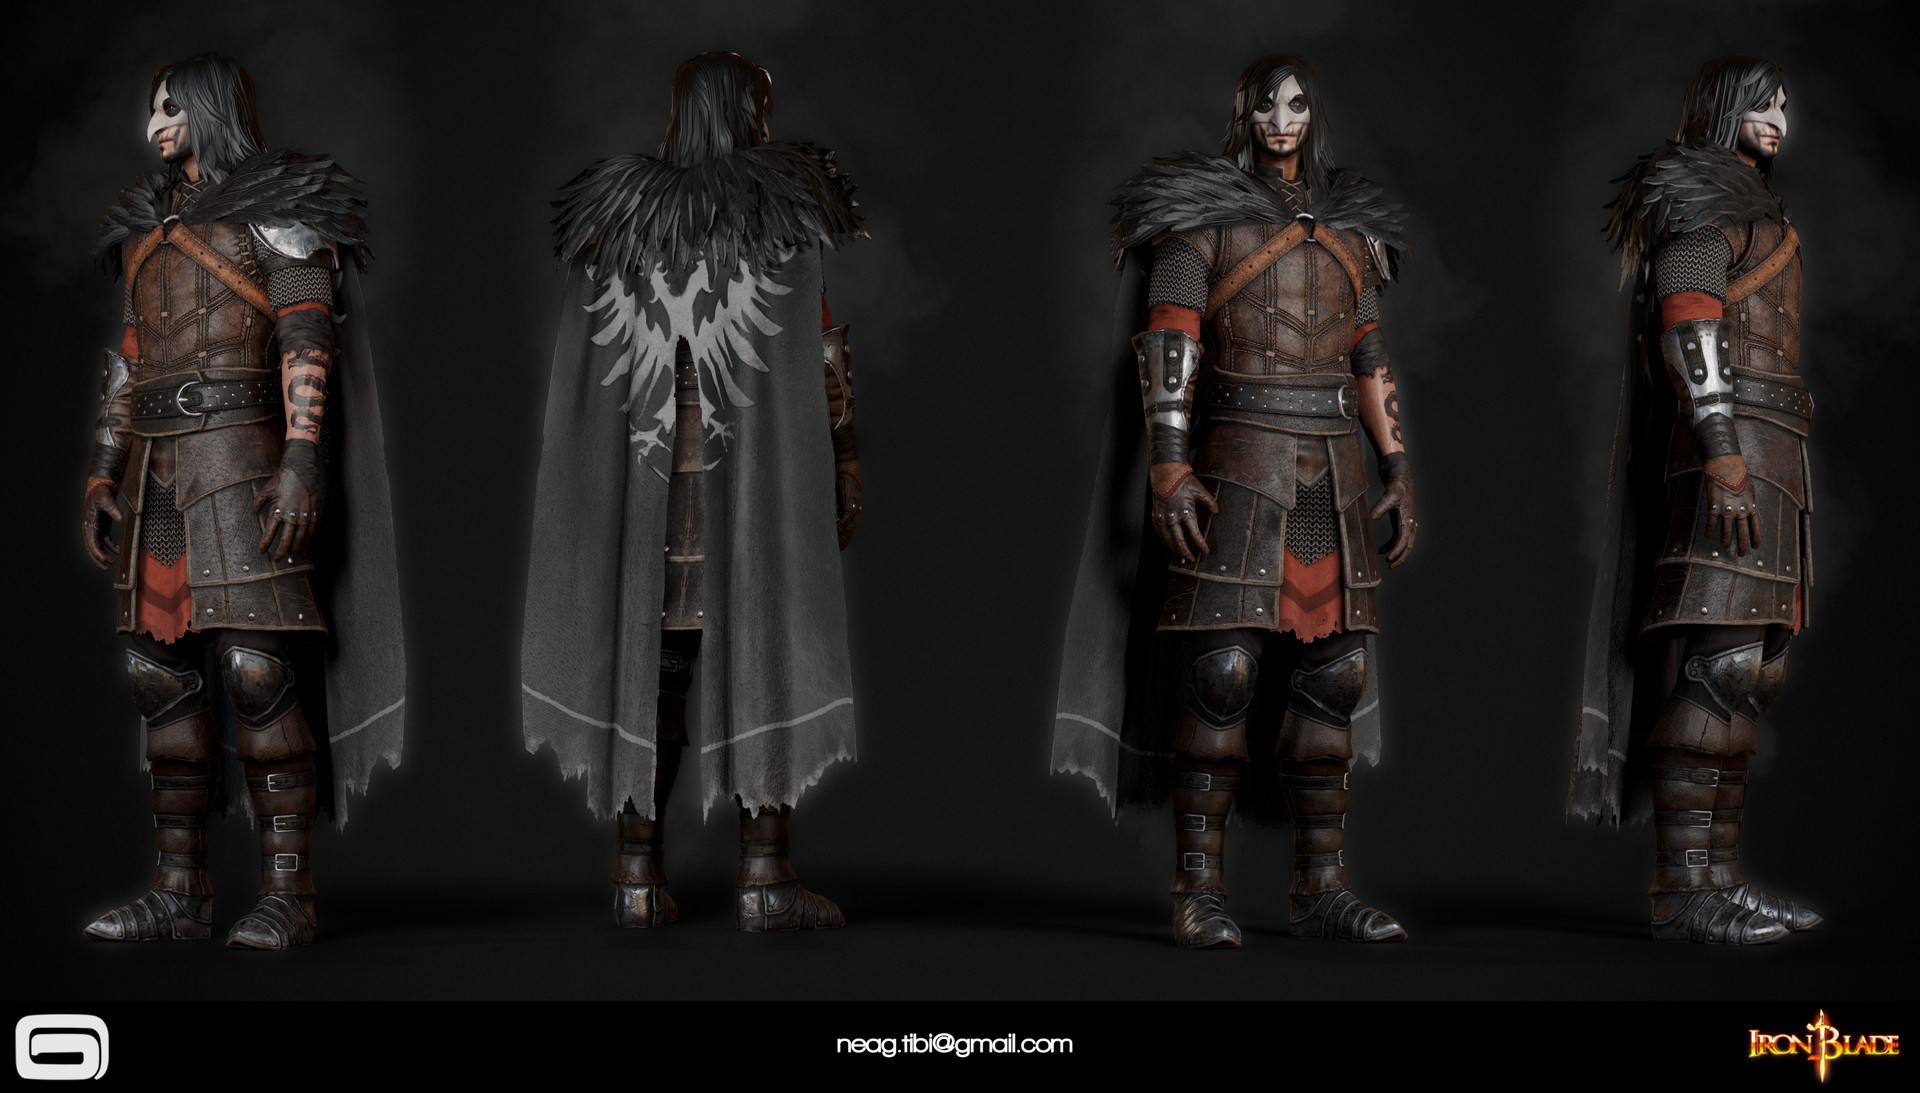 Tibi neag tibi neag iron blade mc armor 11b low poly resize